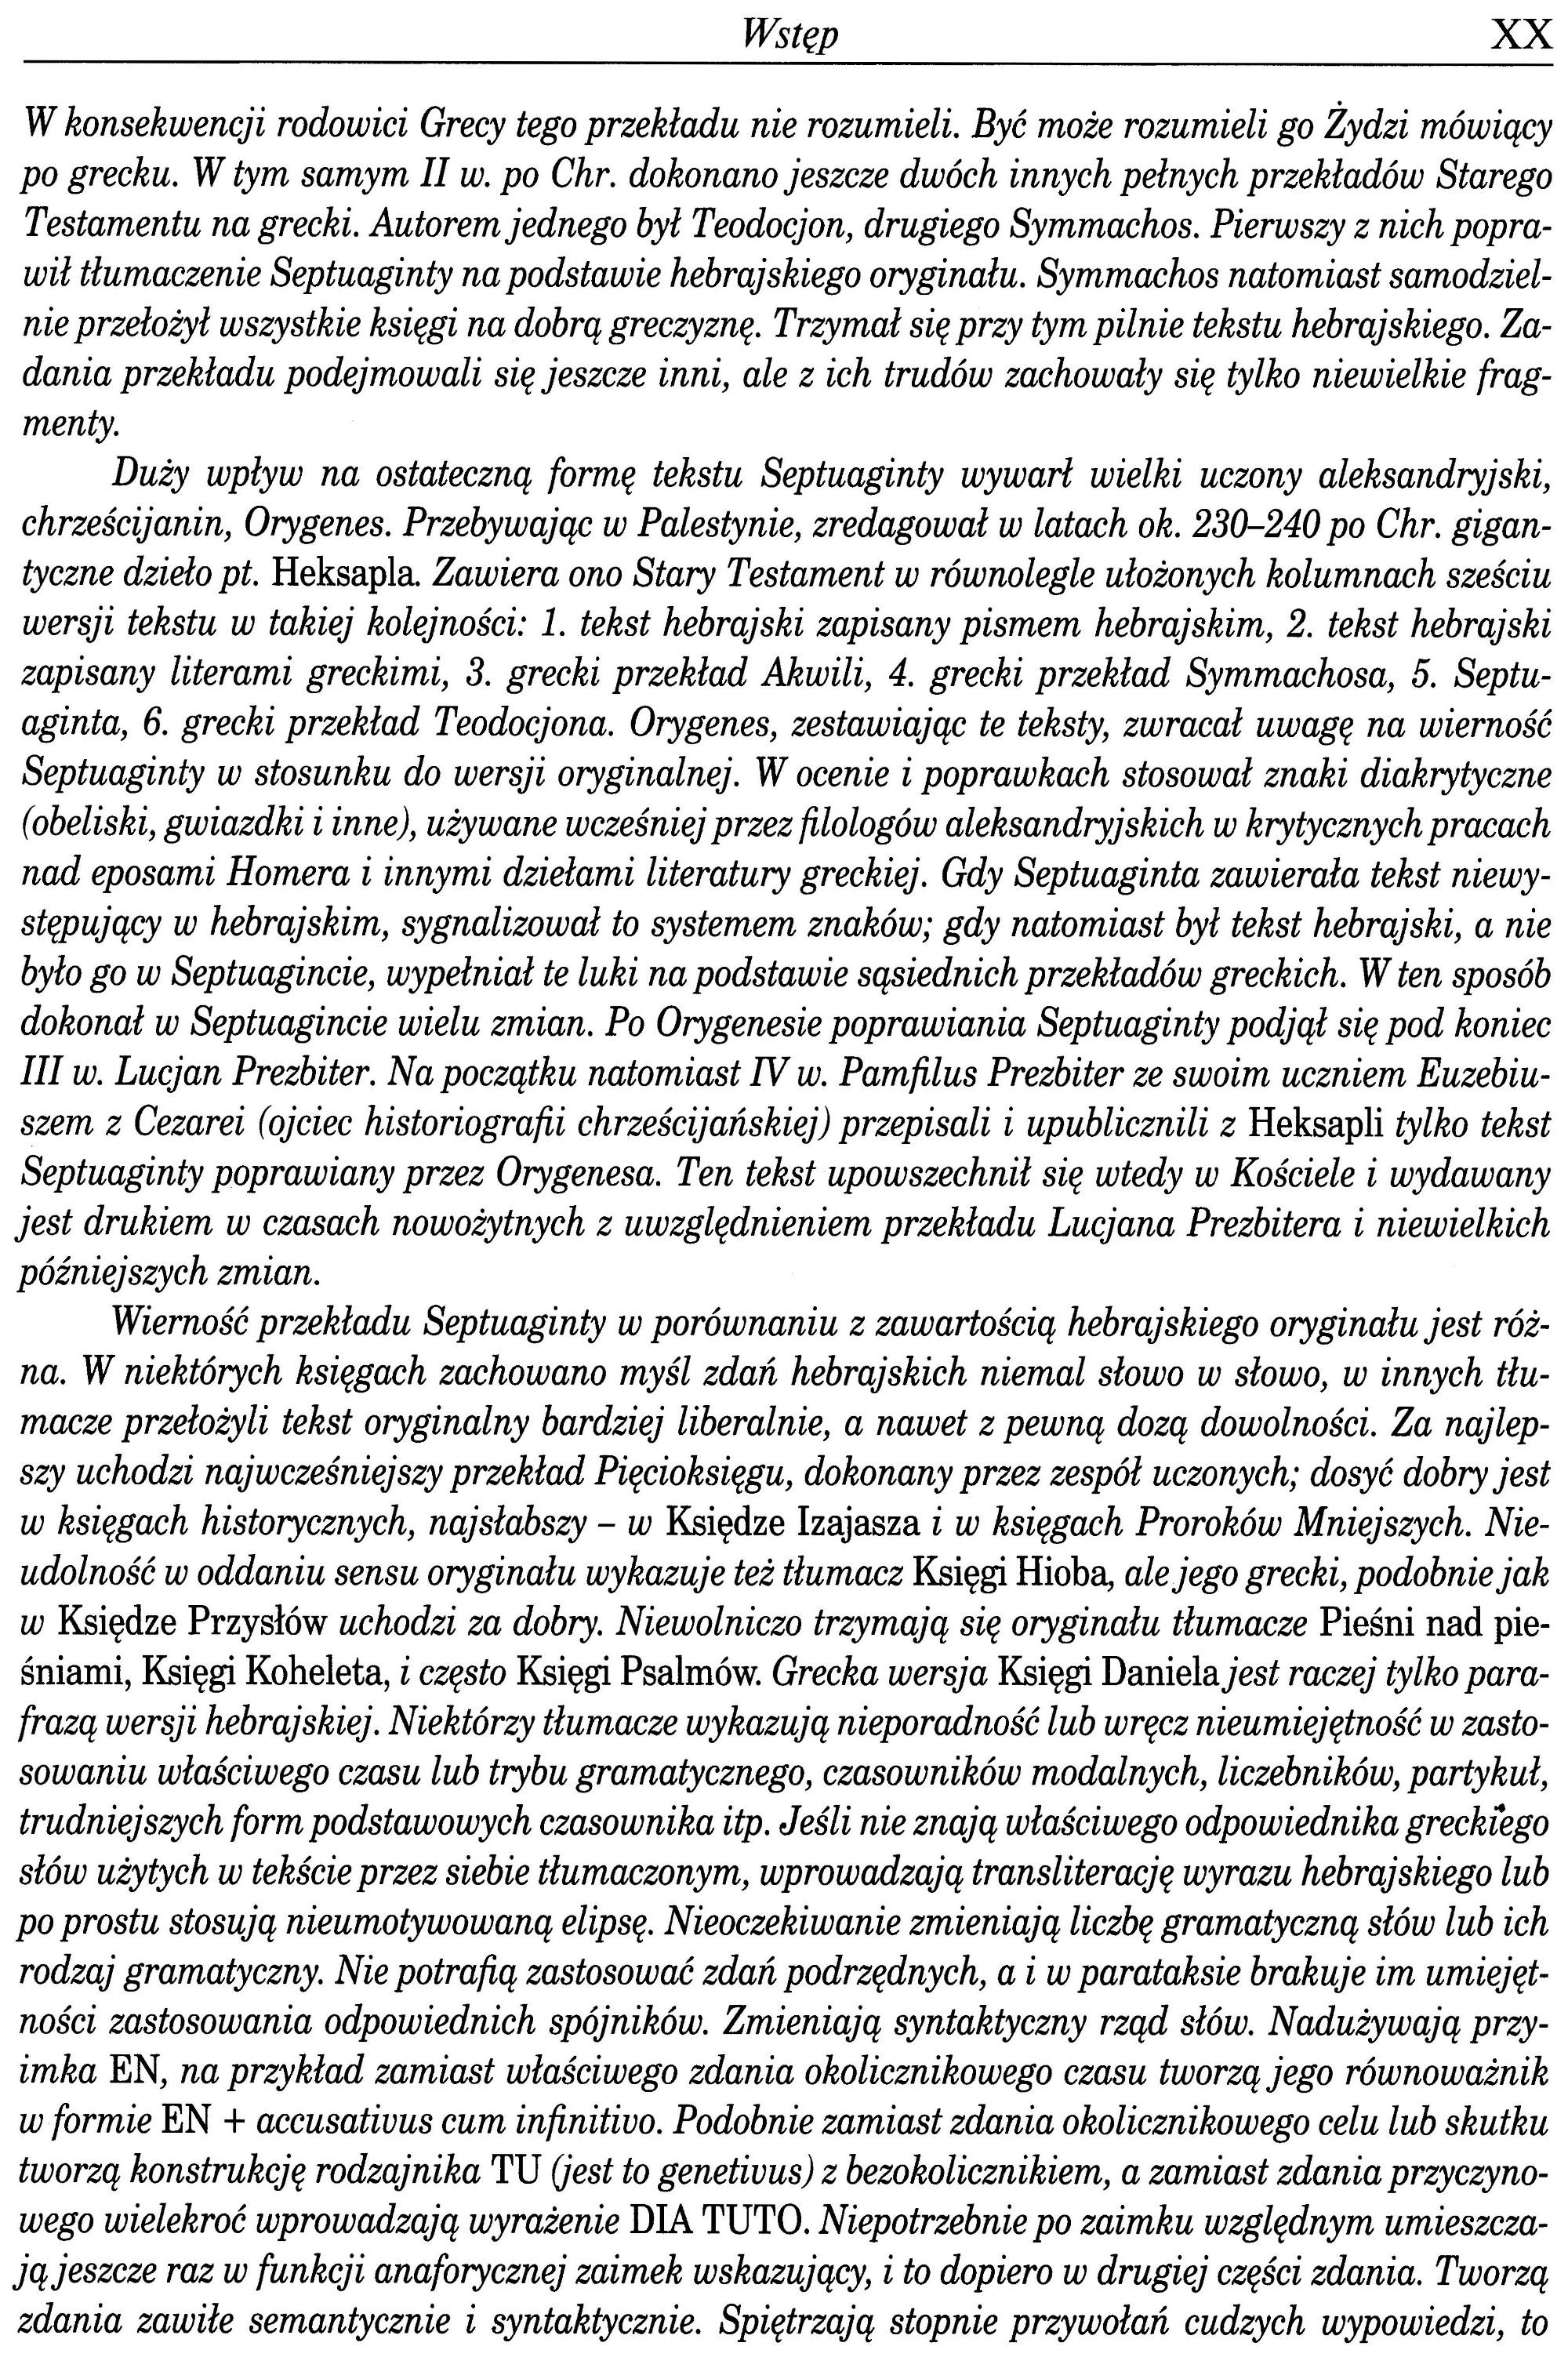 Septuaginta Vocatio po polsku